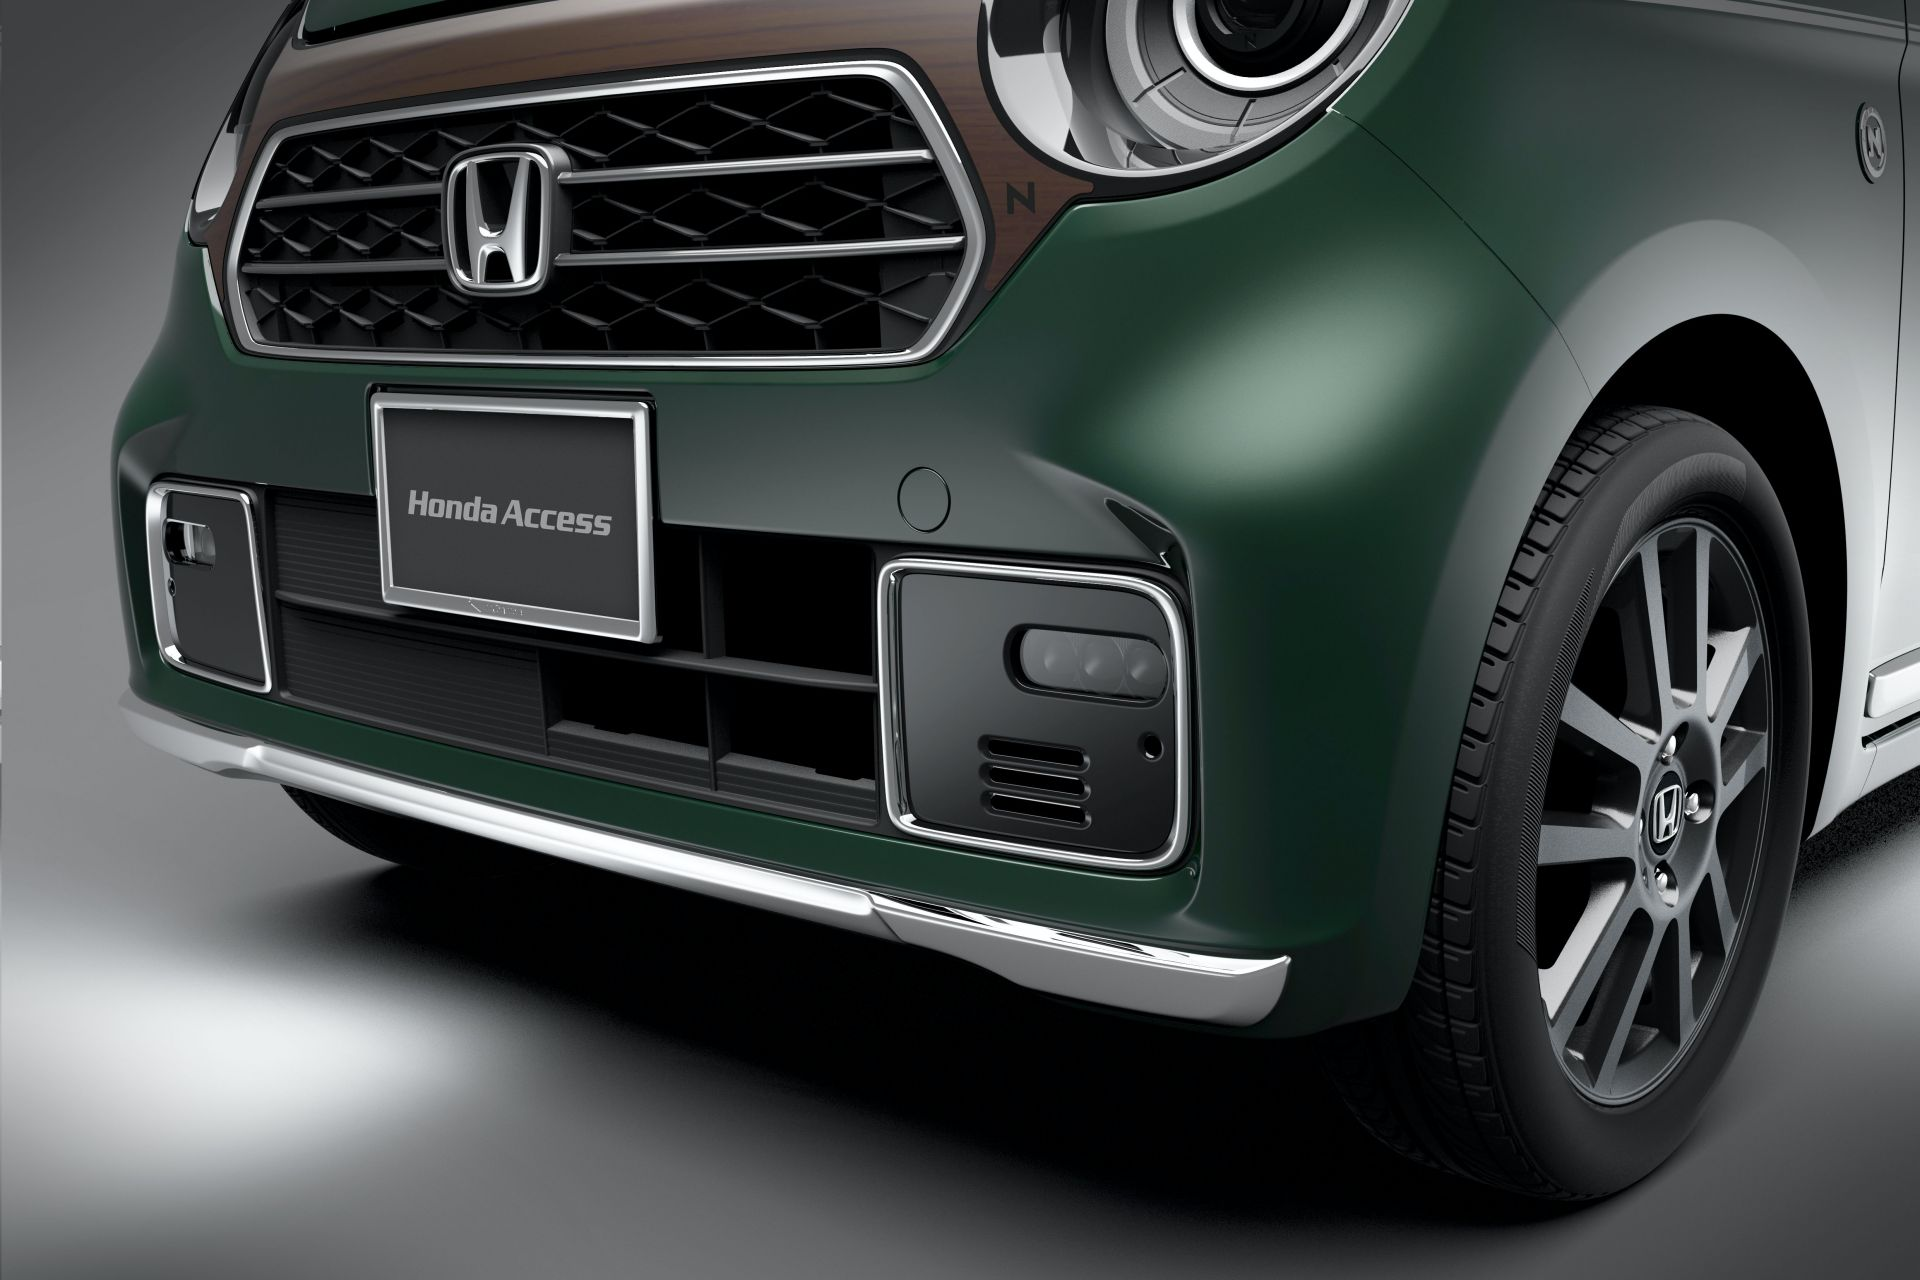 Honda-Access-for-2021-N-One-JDM-spec-5-1